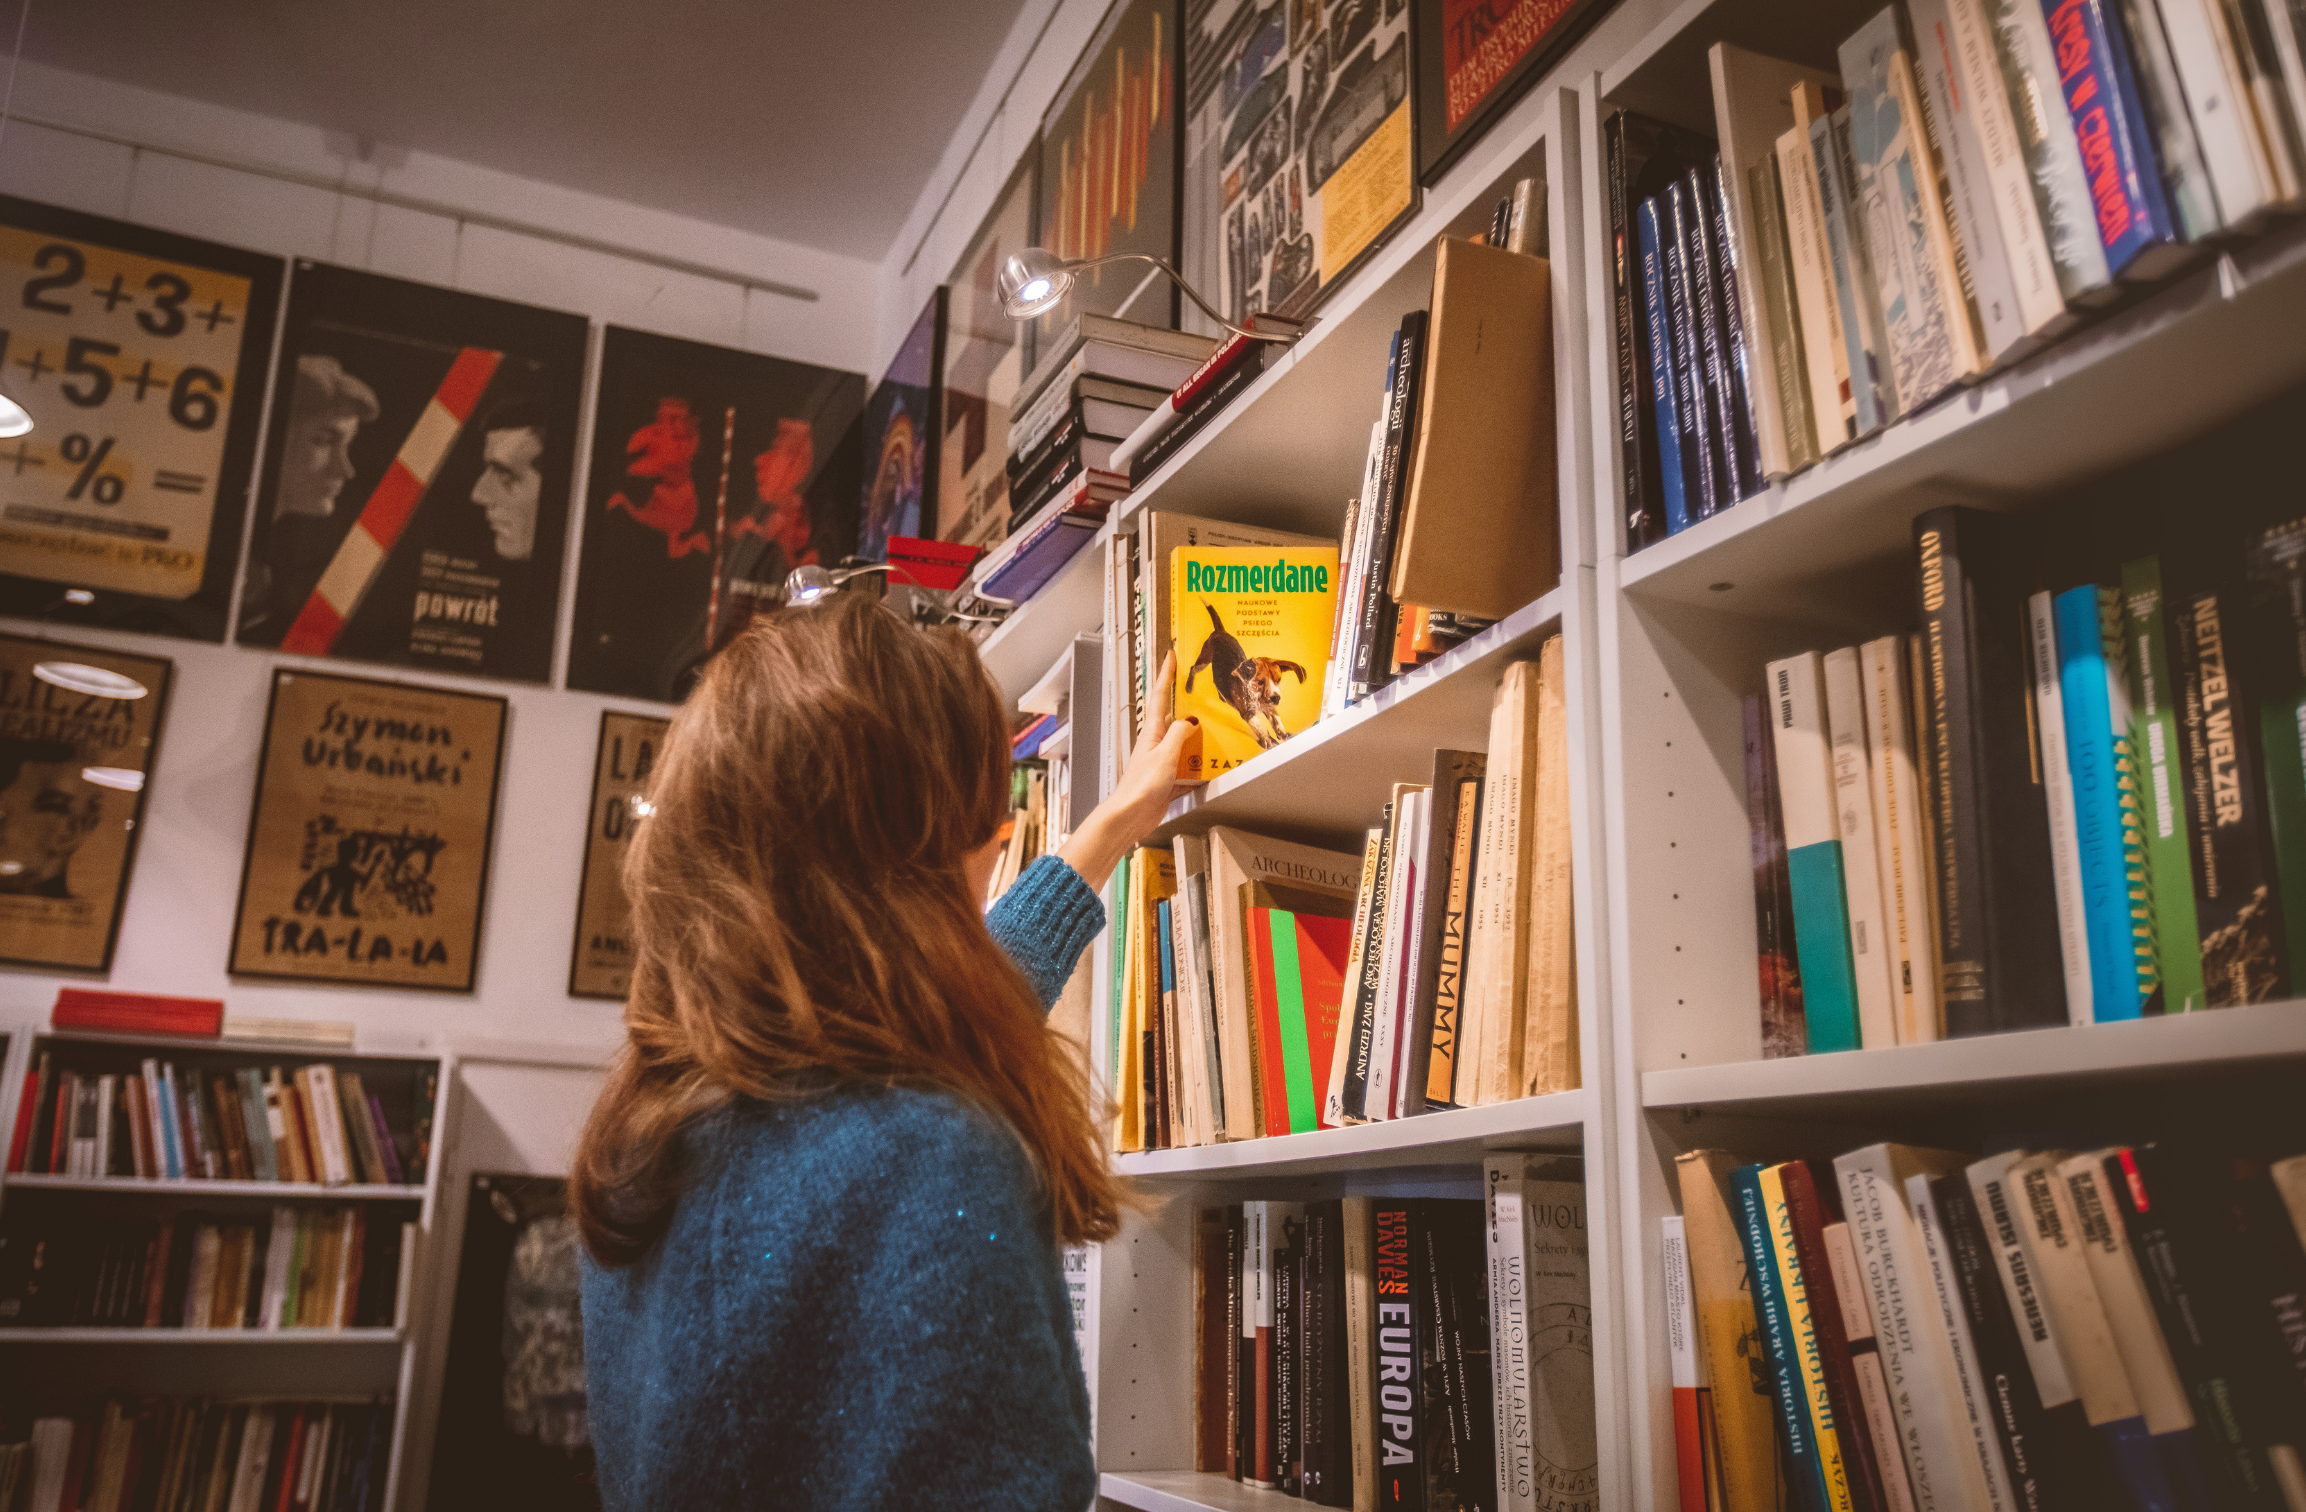 Rozmerdane – Recenzja książki